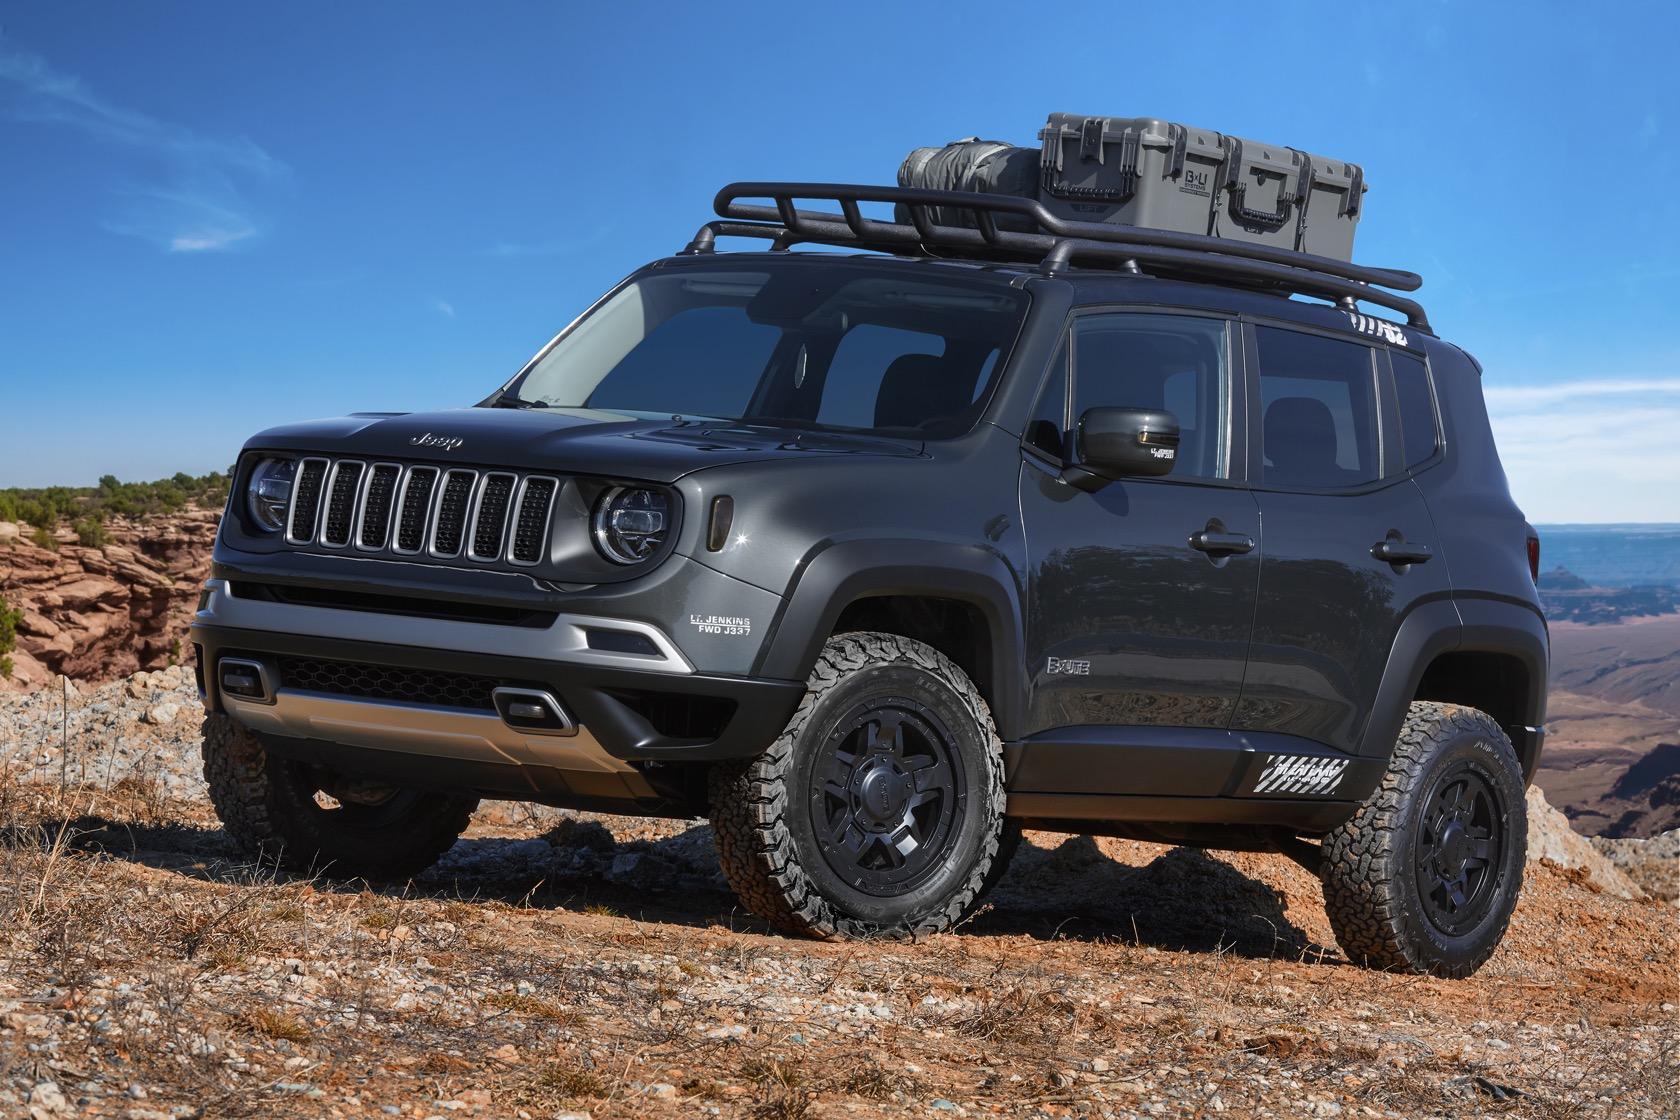 These 7 Jeep Safari concepts span Retro to Baja beast - SlashGear